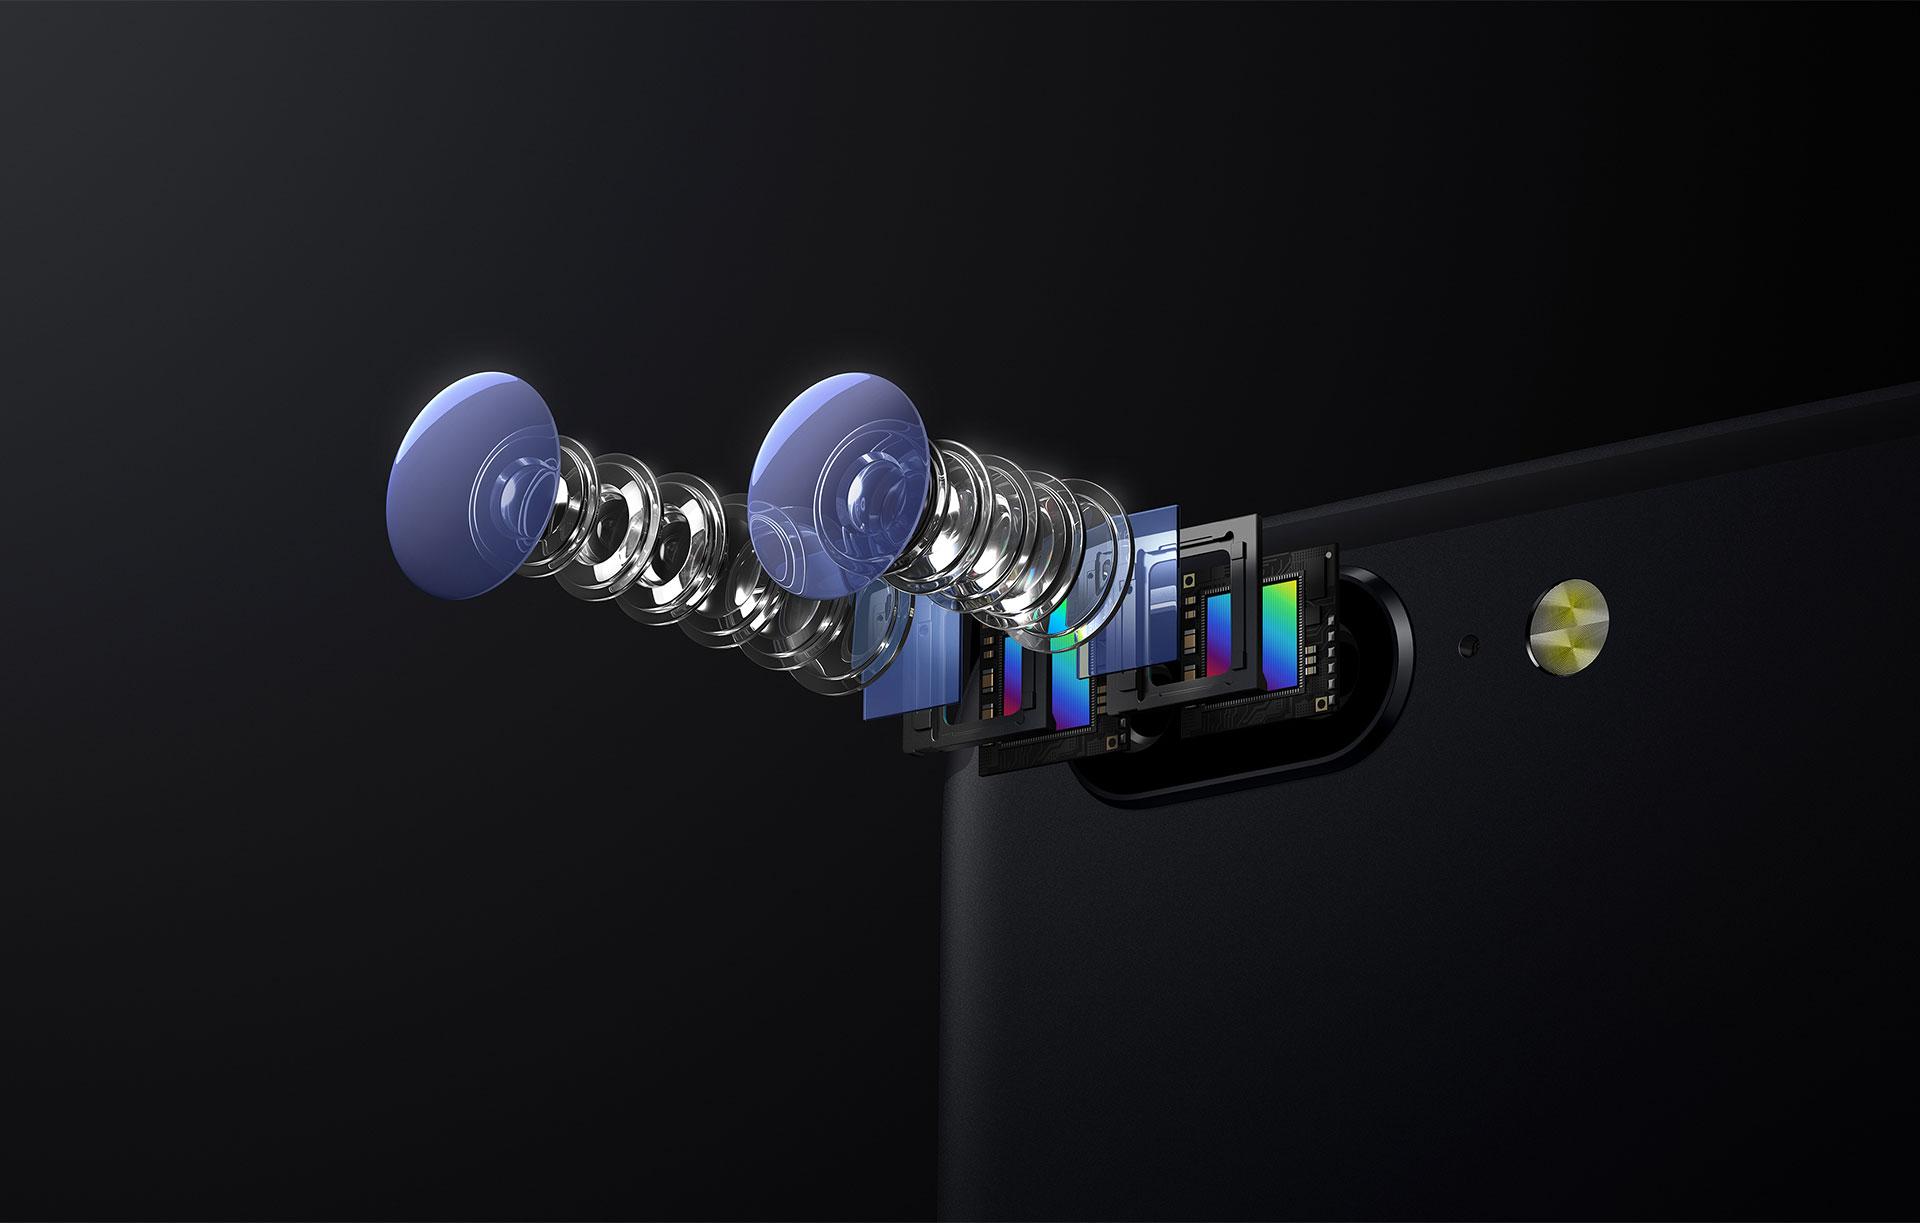 https://vmart.pk/wp-content/uploads/2017/08/products-lens.jpg